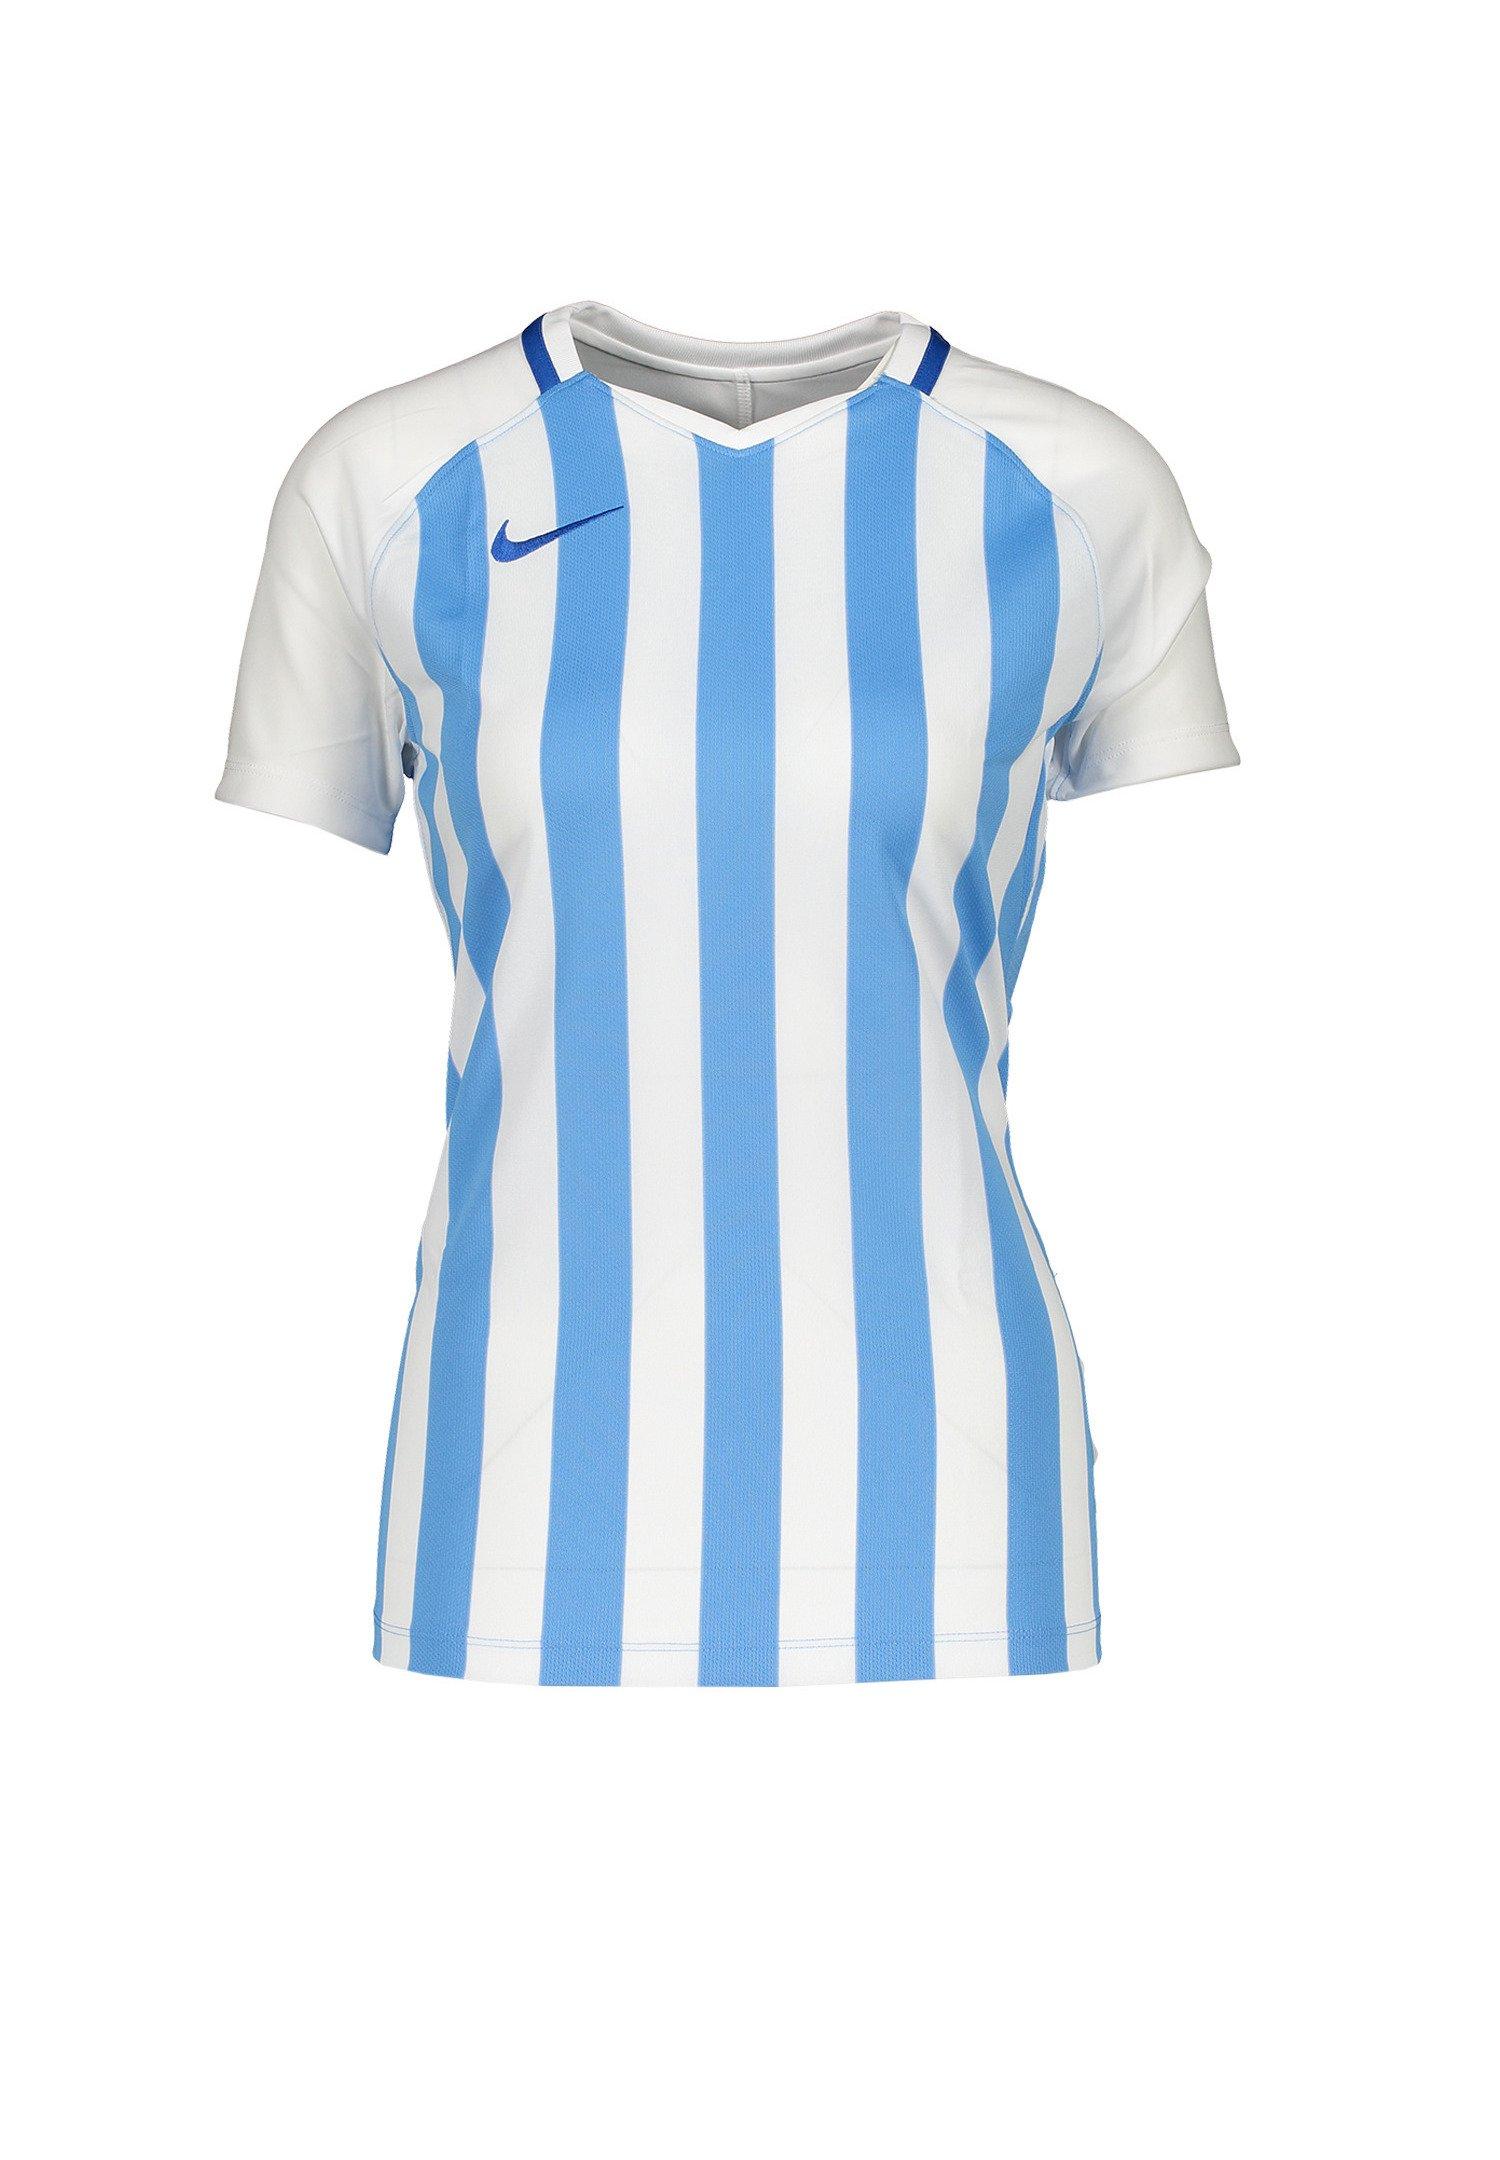 Damen FUSSBALL - TEAMSPORT TEXTIL - TRIKOTS STRIPED DI - T-Shirt print